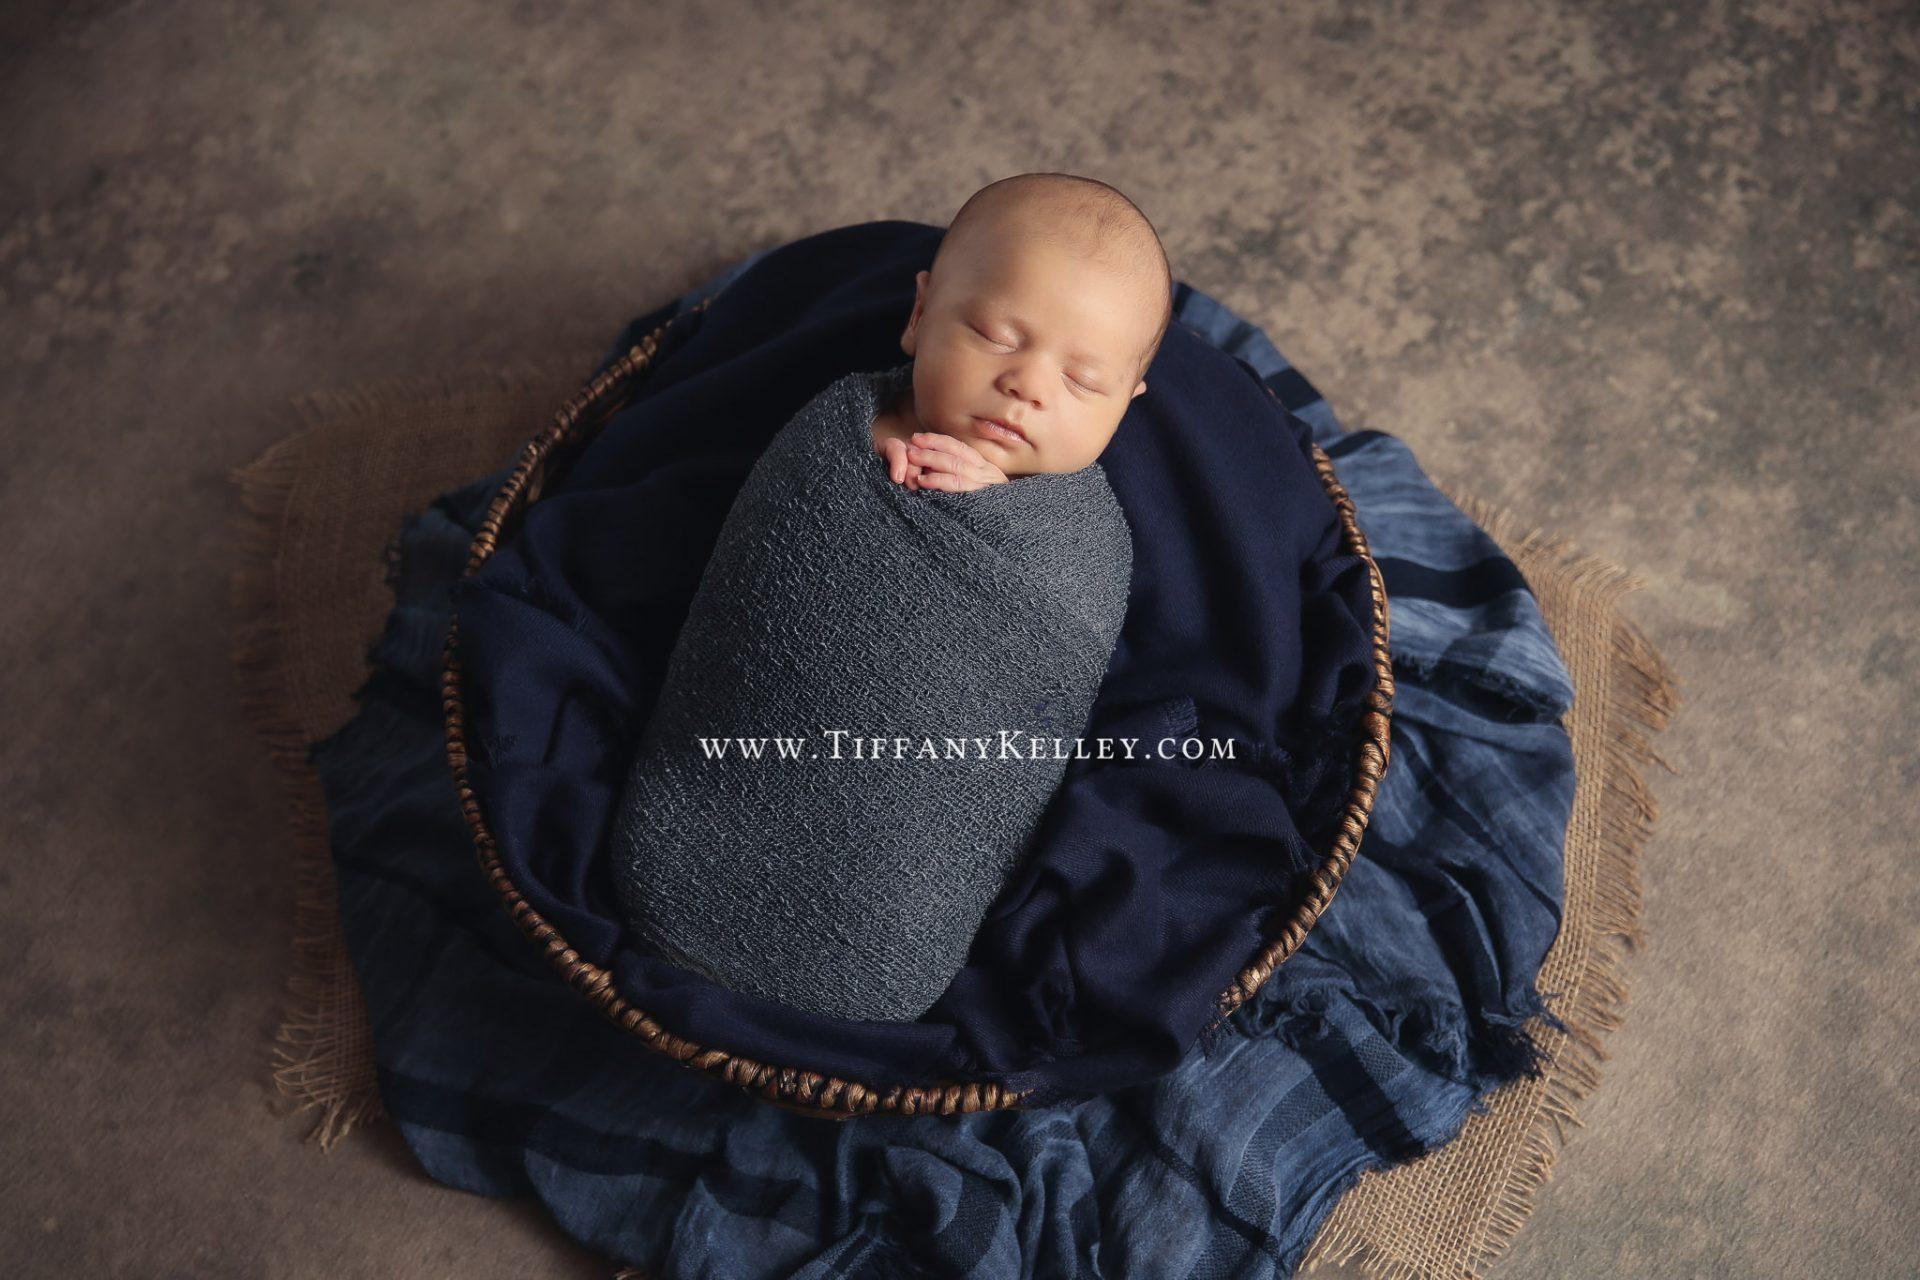 Owen Branson and Springfield MO Newborn Photographer Tiffany Kelley Photography